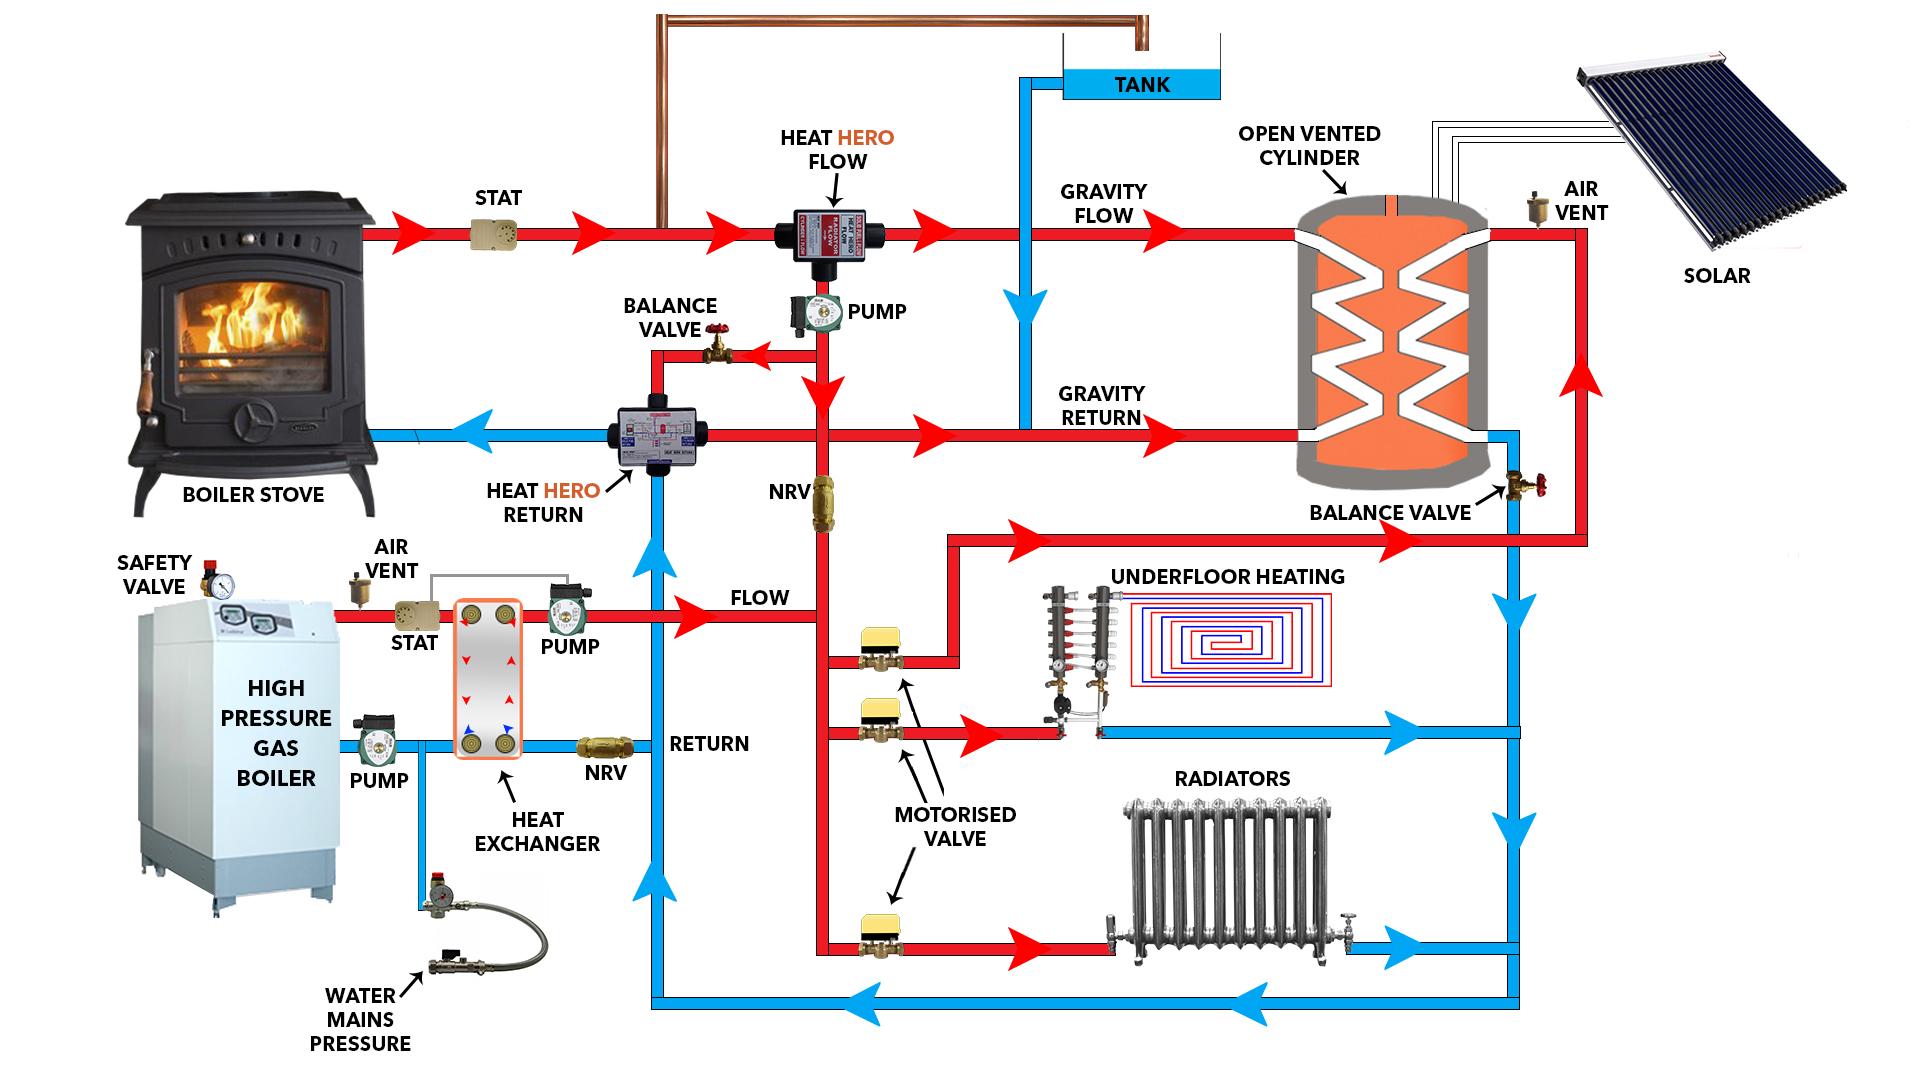 Heat Hero Gravity Technical